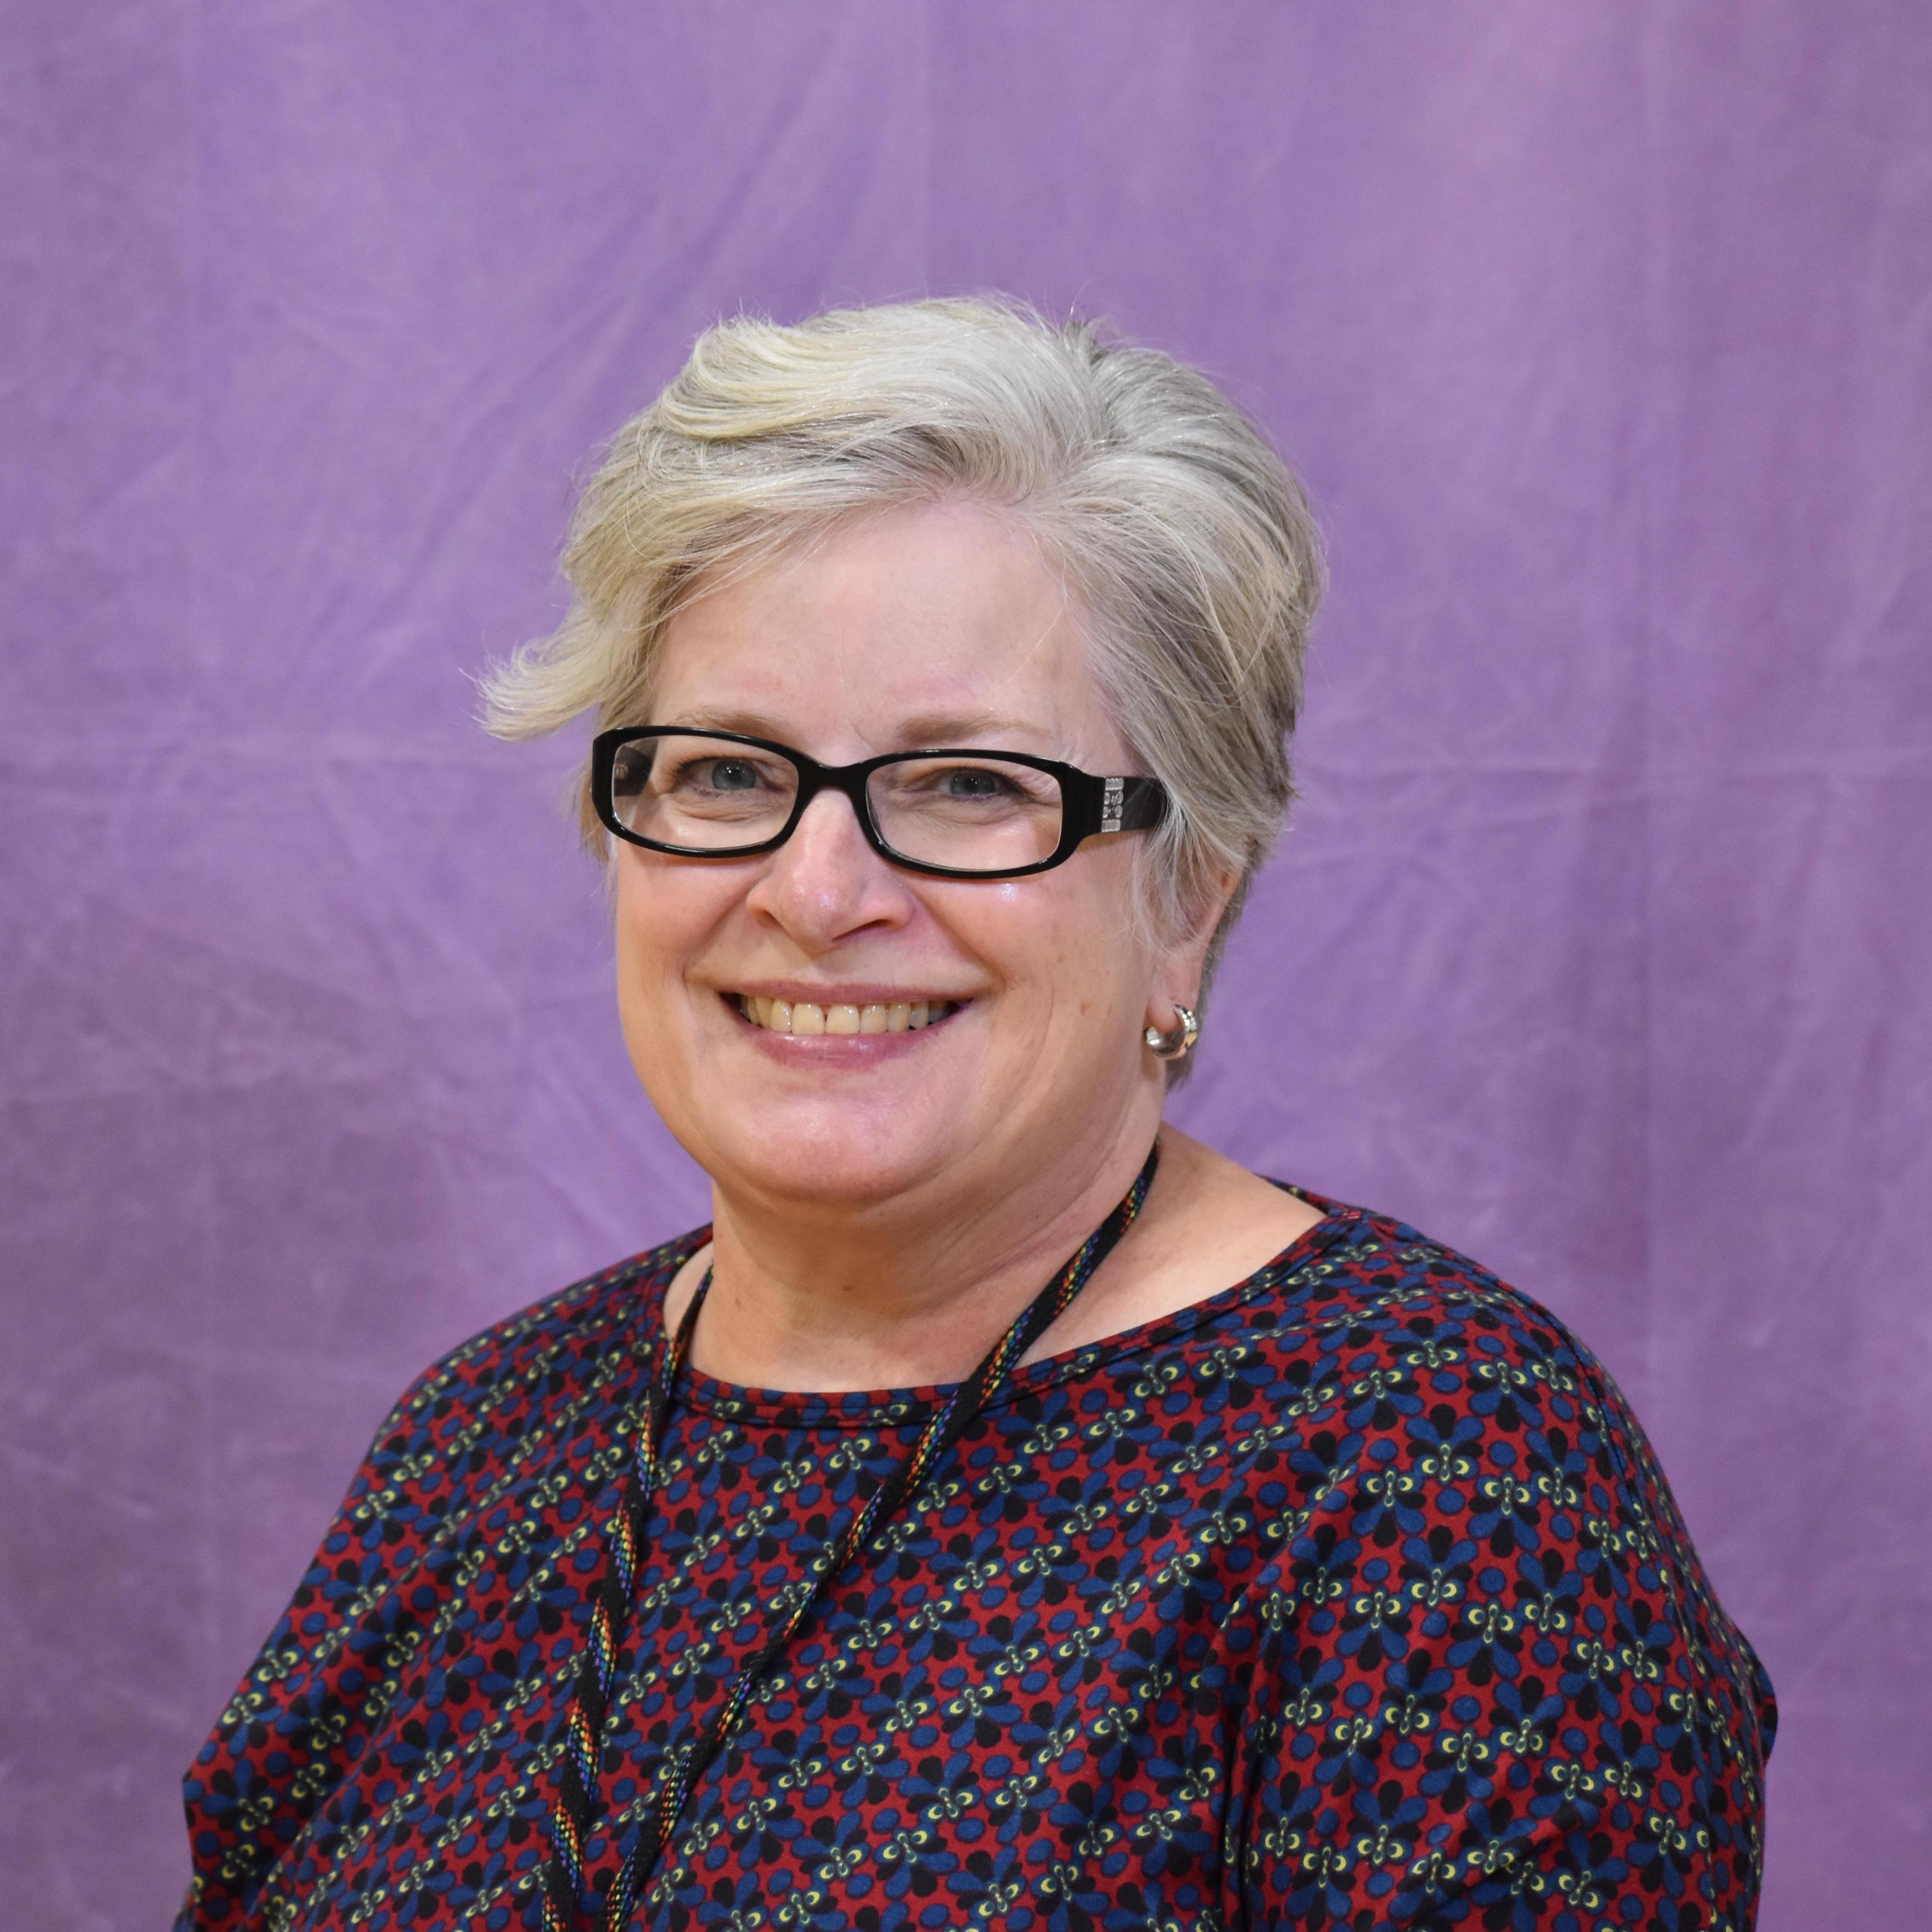 Lori DeMoss's Profile Photo